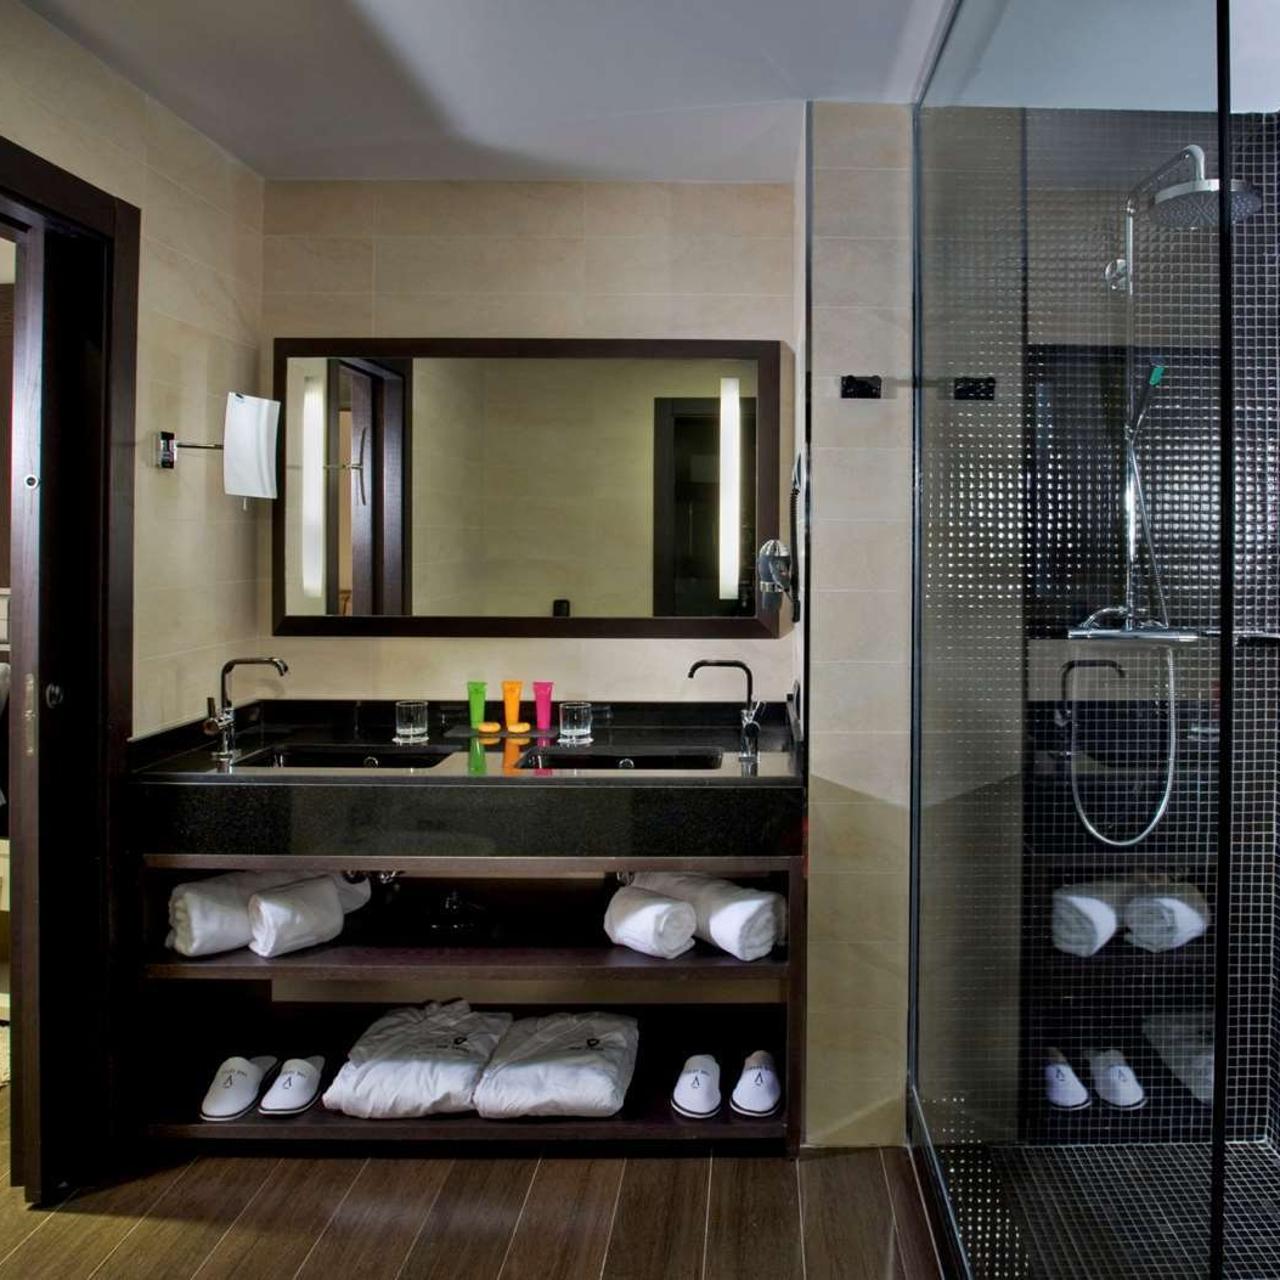 Hotel Meliá Sol Y Nieve 4 Hrs Star Hotel In Granada Andalusia